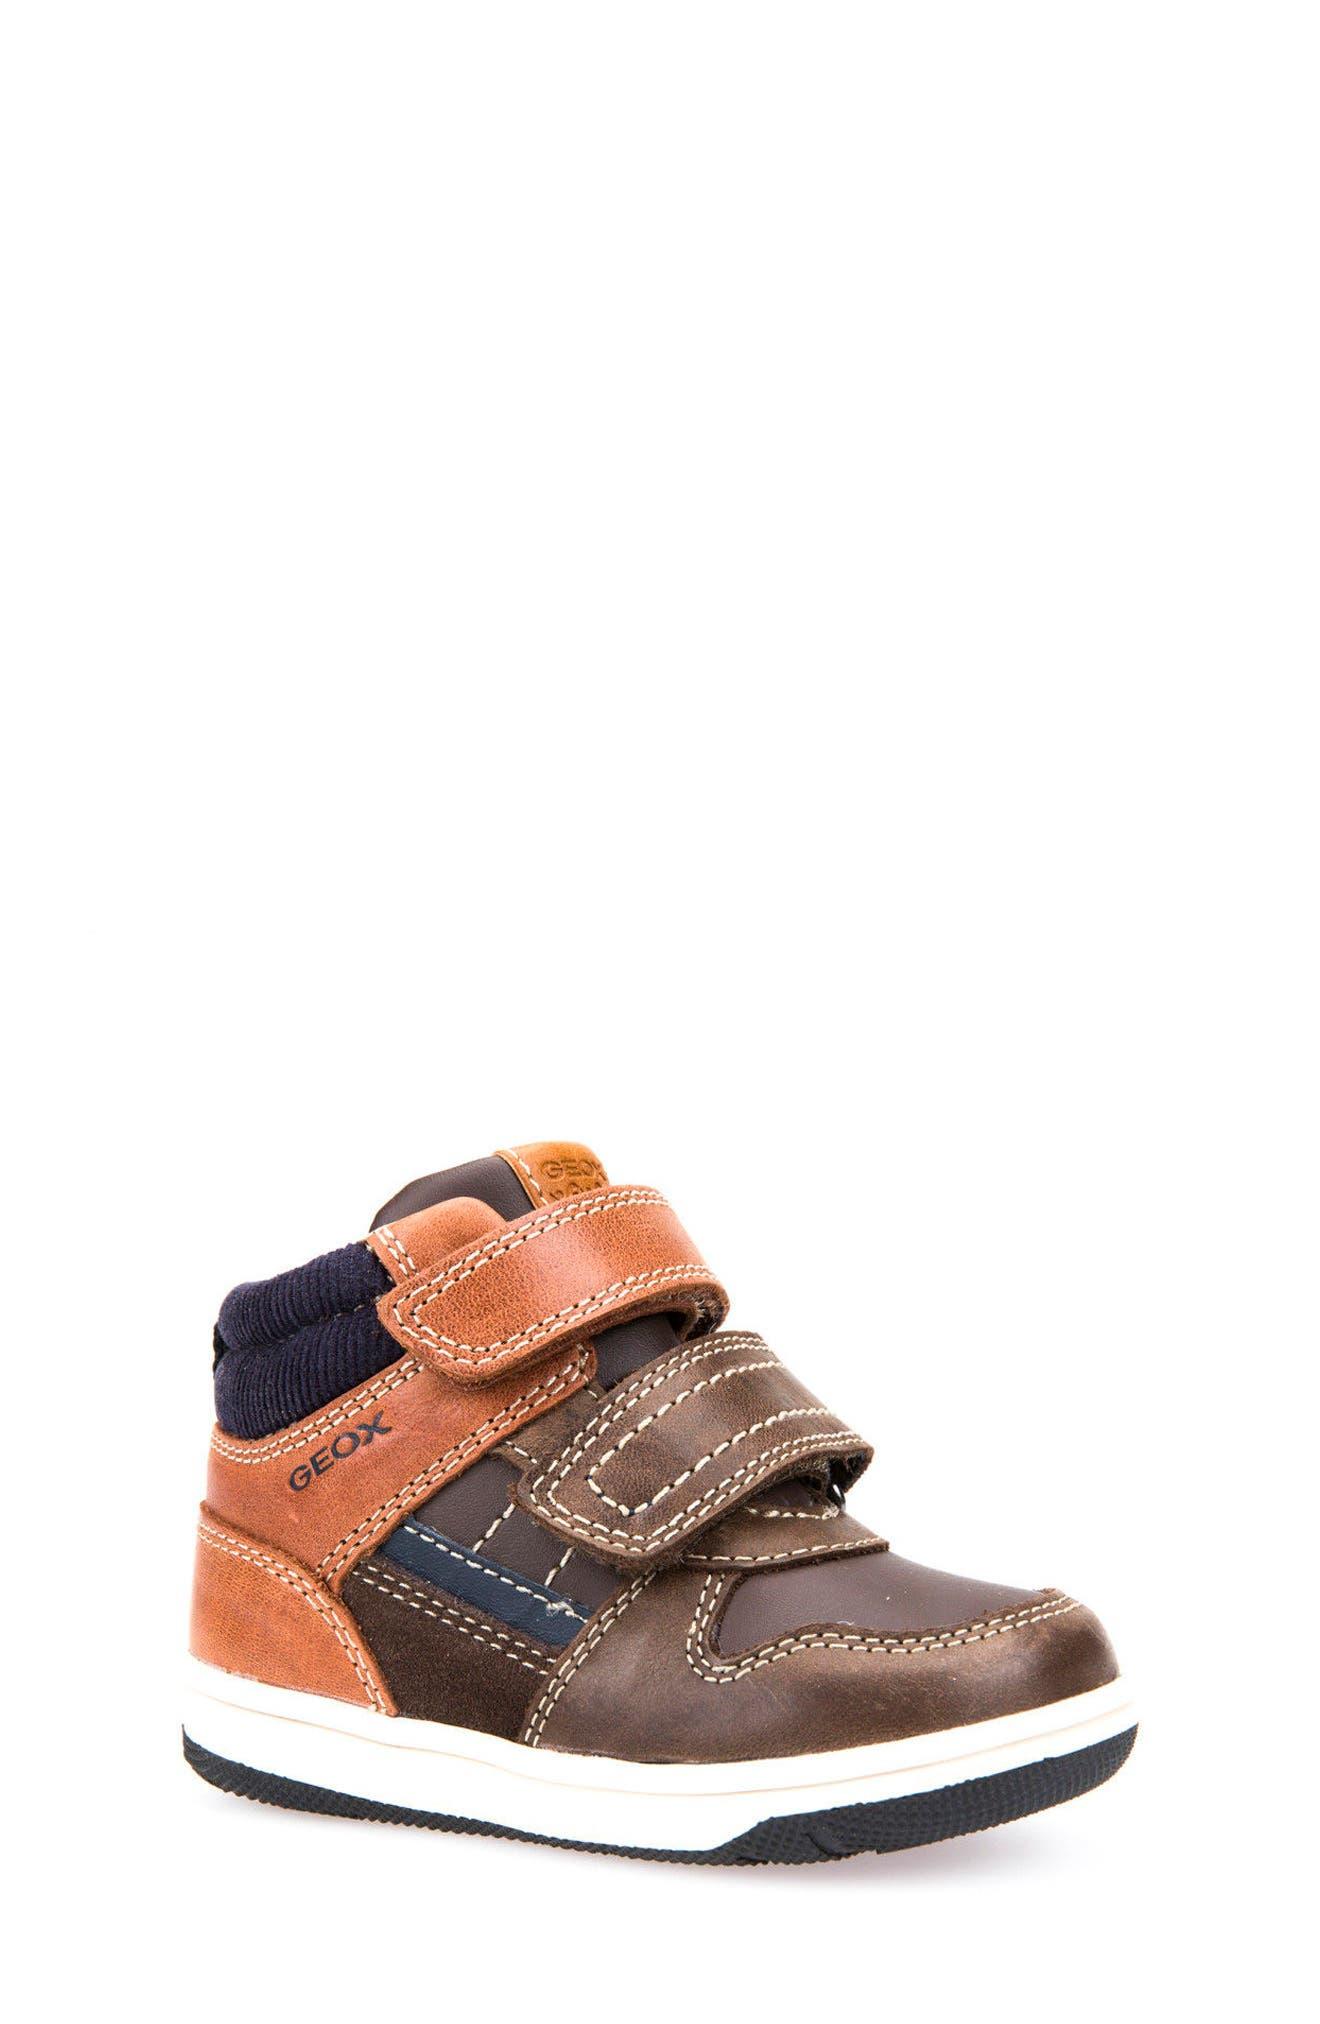 Alternate Image 1 Selected - Geox New Flick Mid Top Sneaker (Walker & Toddler)